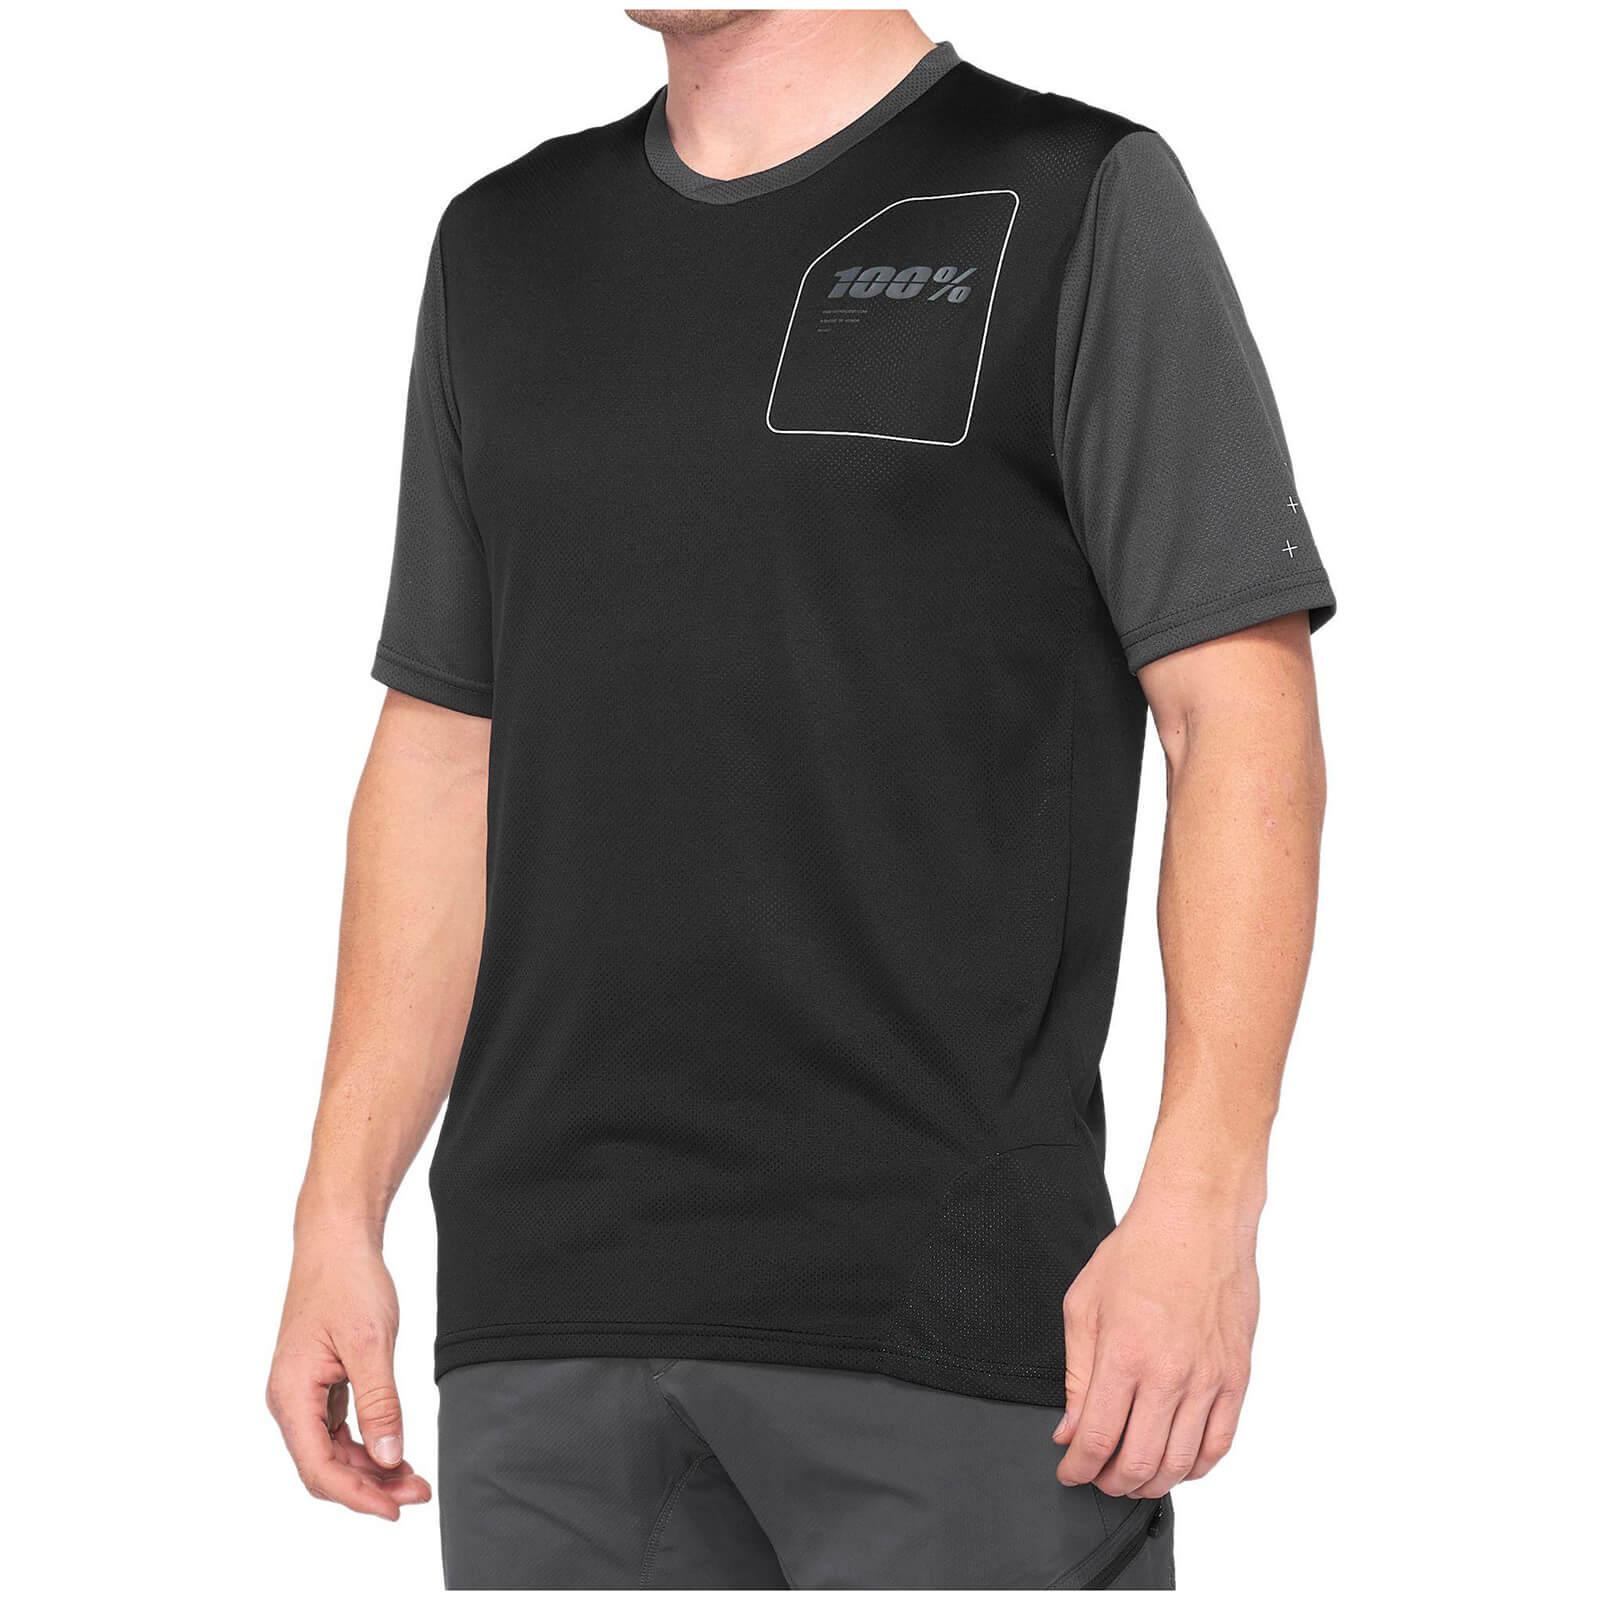 100% Ridecamp MTB Jersey - XL - Charcoal/Black